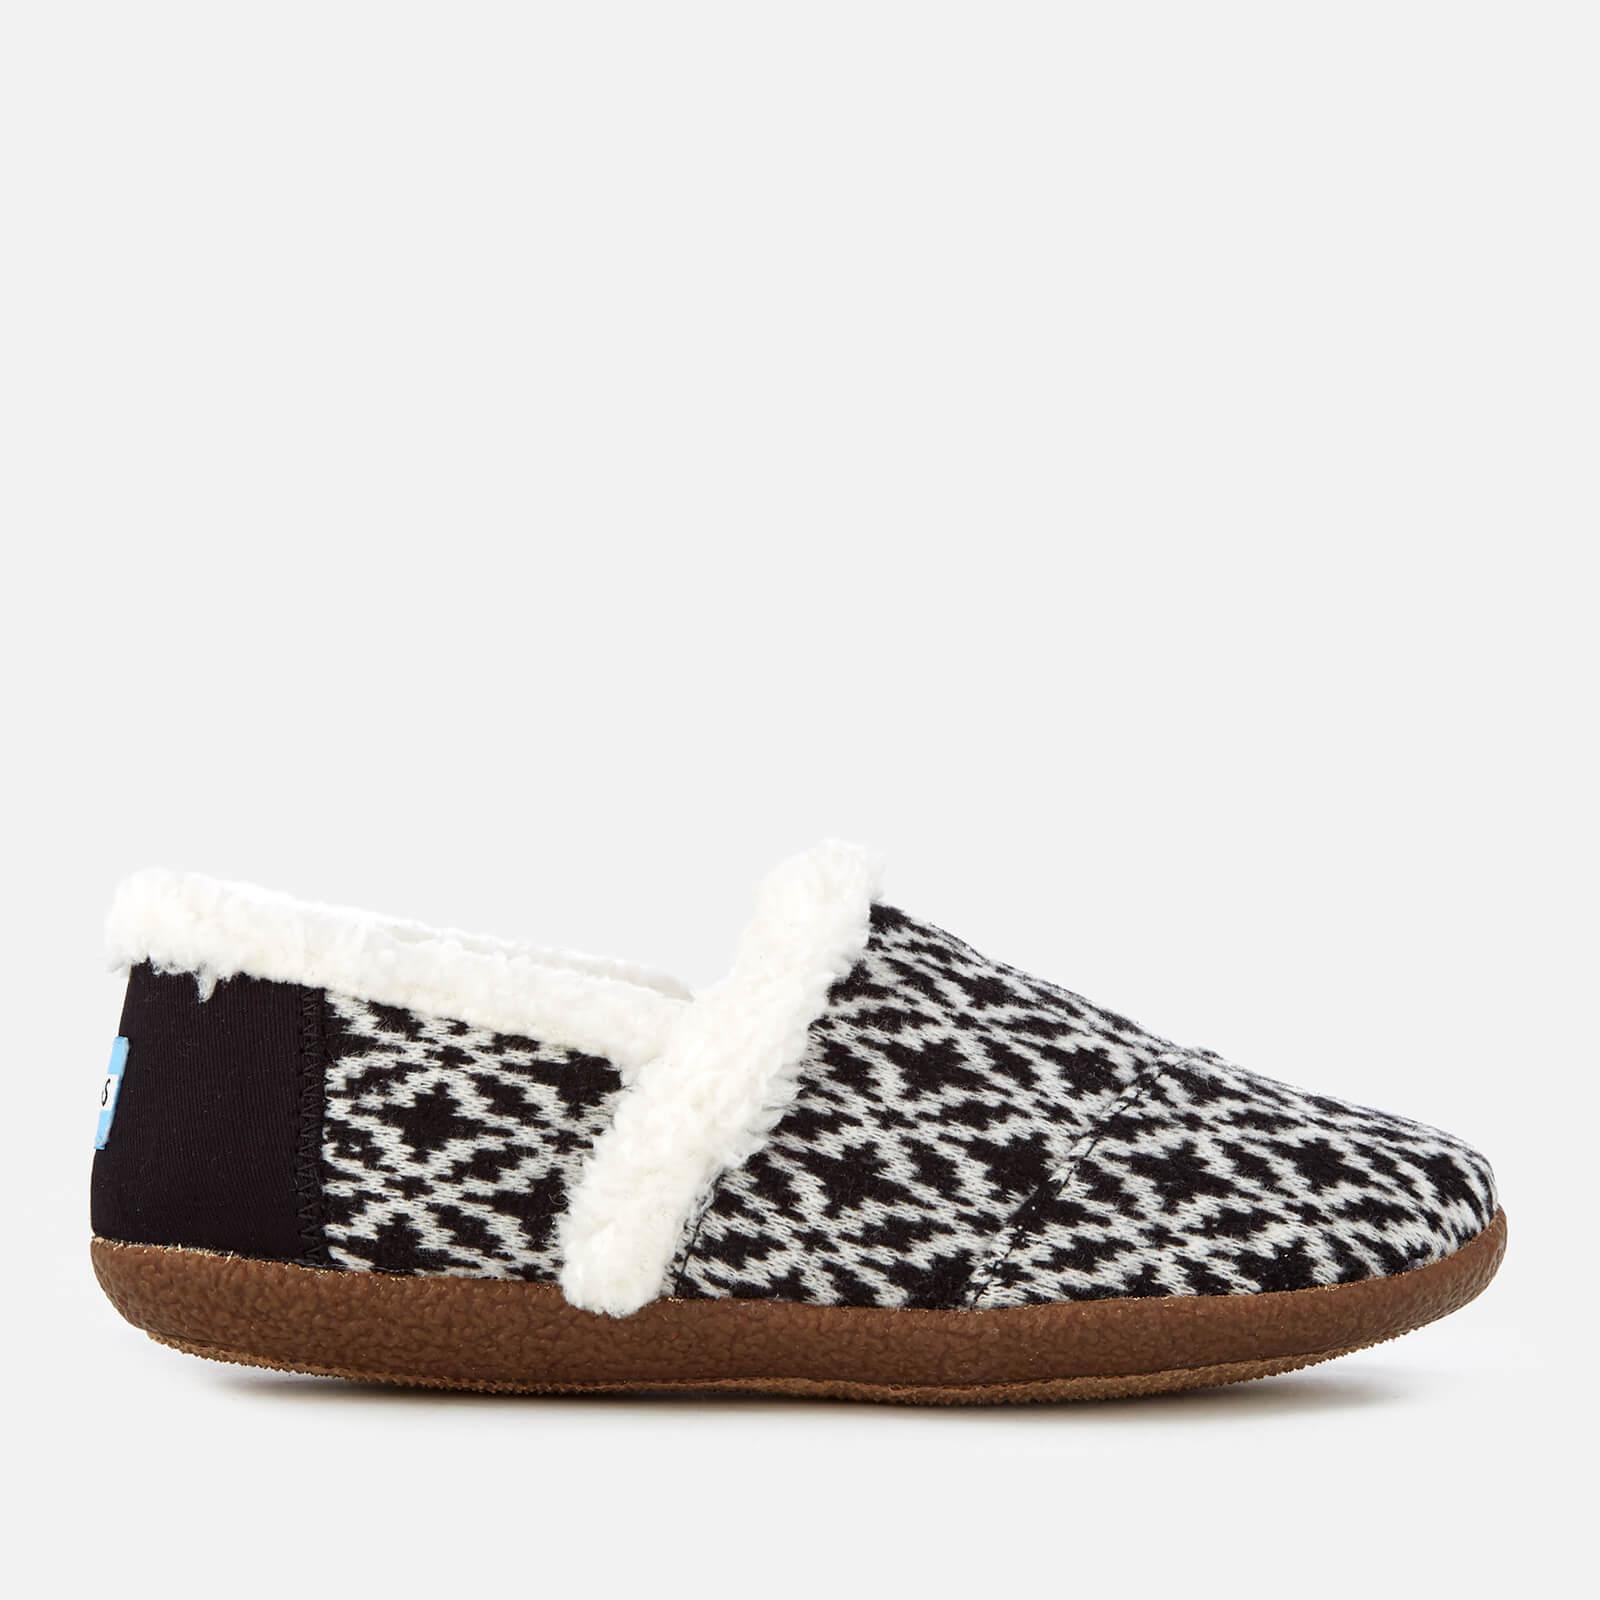 e9ee7e858c4 TOMS Women s Full Slippers - Black White Fair Isle Womens Footwear ...